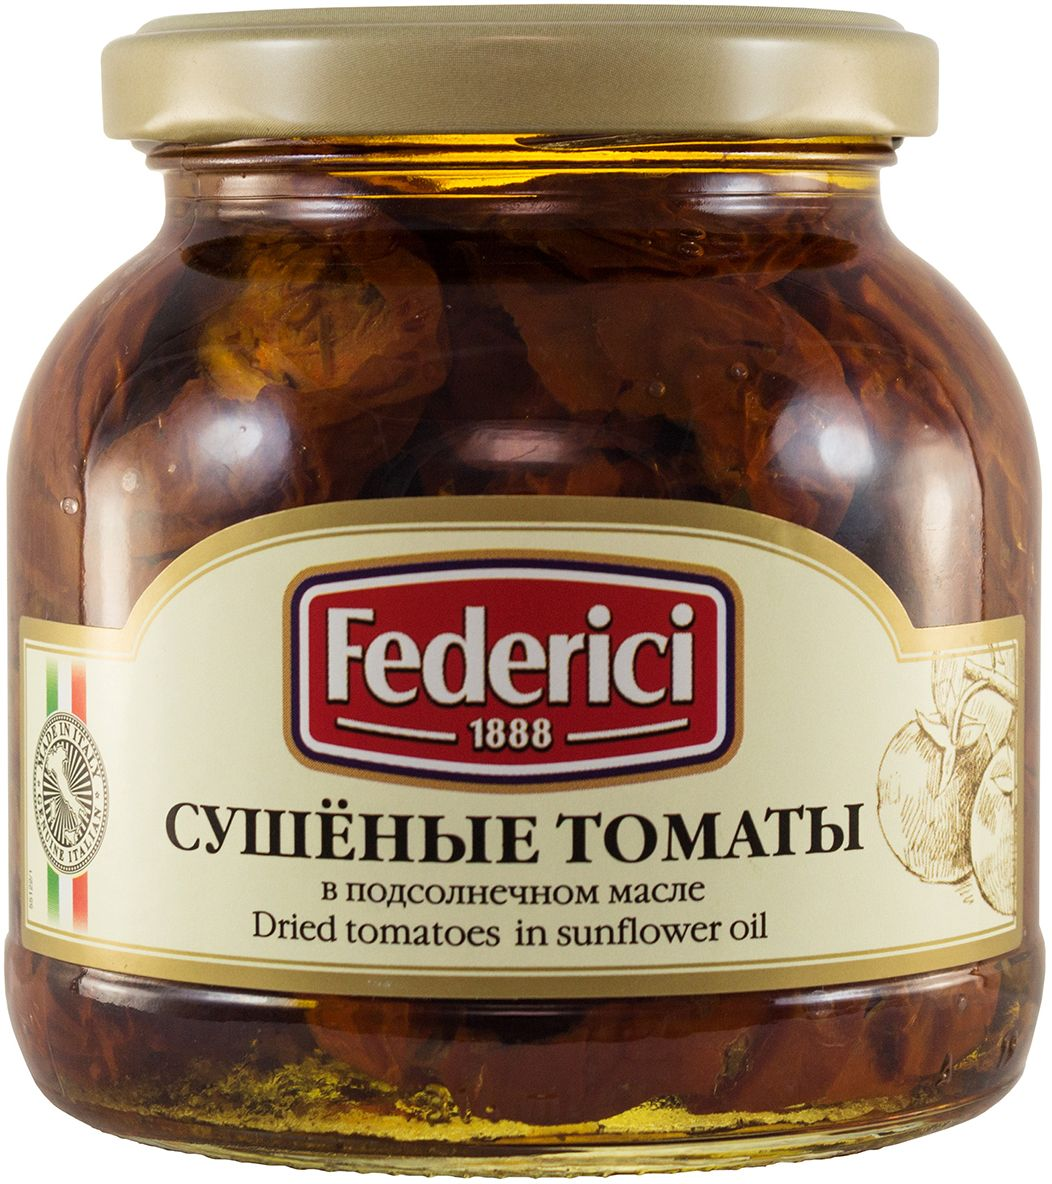 Federici Сушеные томаты в подсолнечном масле, 280 г federici spaghetti спагетти 500 г